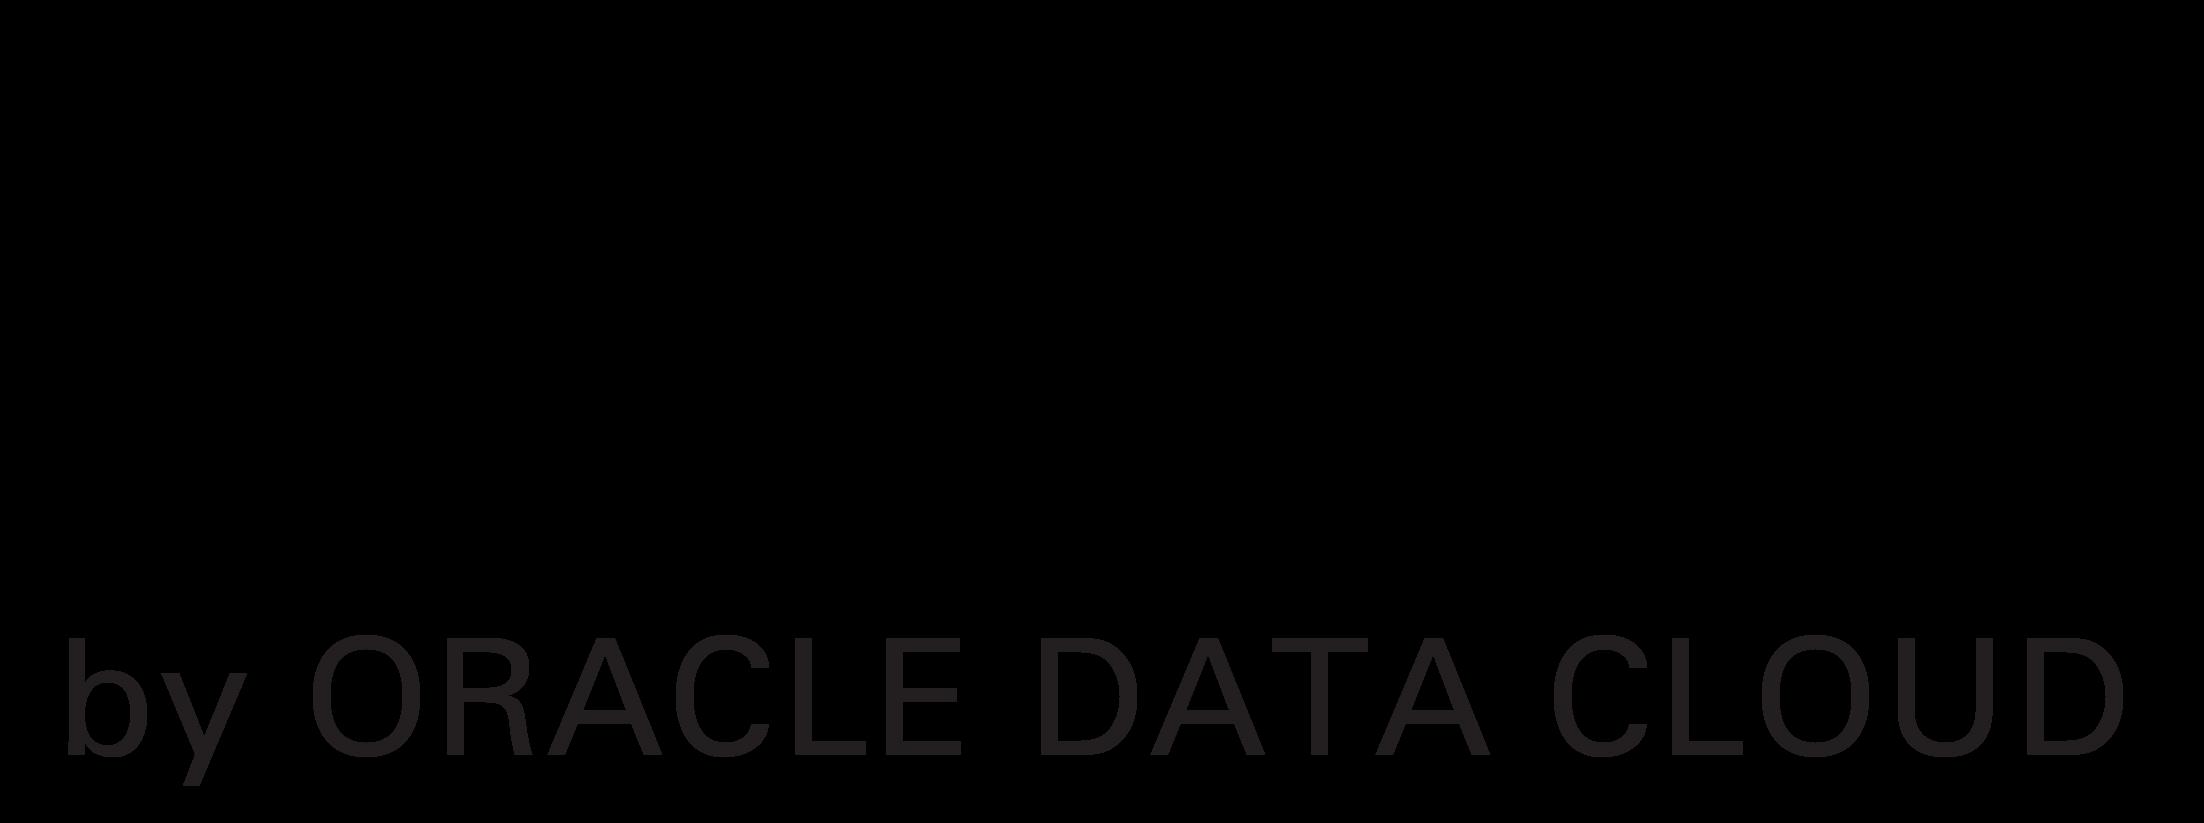 MOAT logo